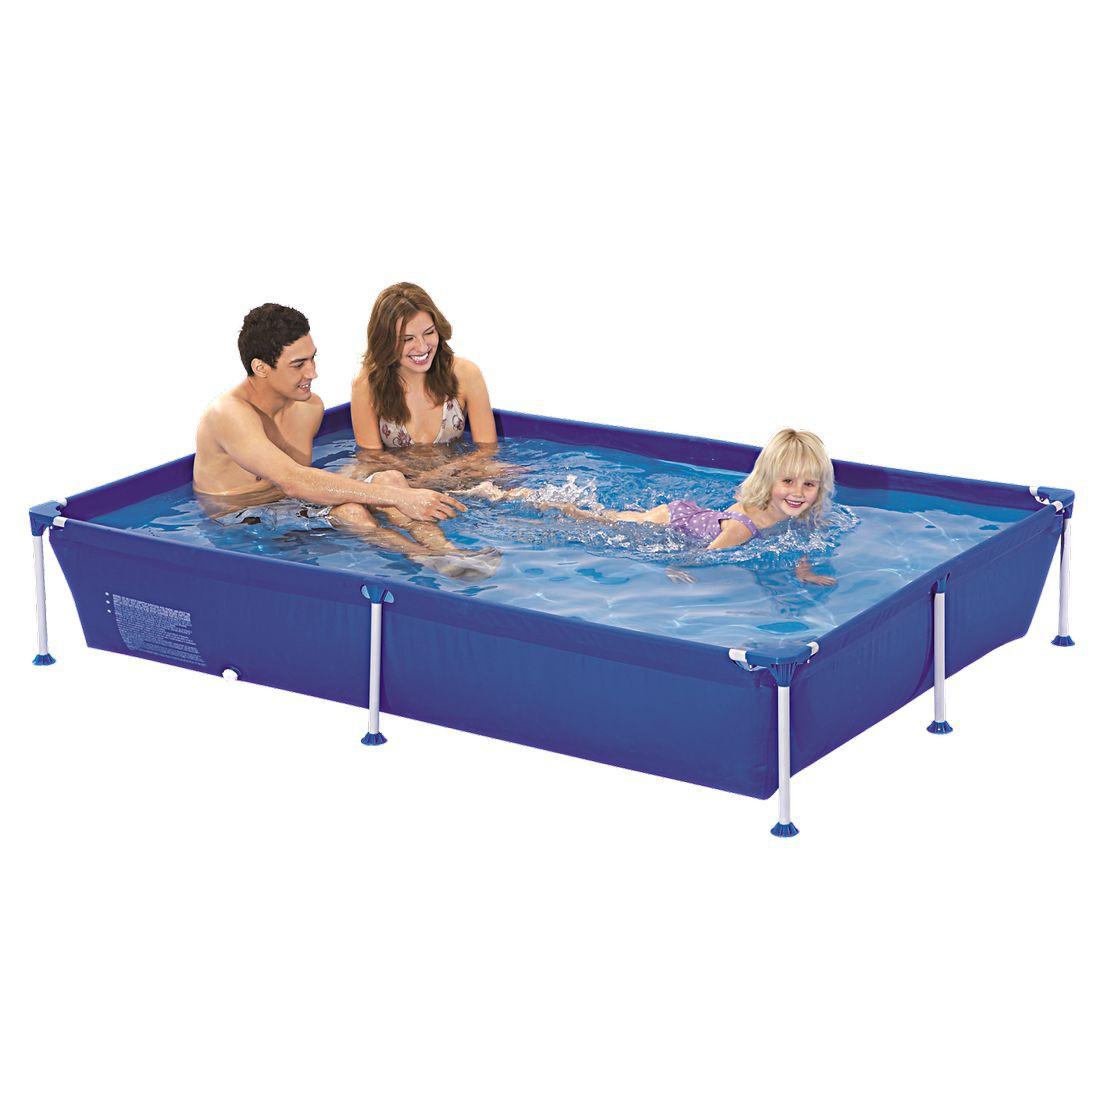 Achetez jilong passaat blue 228 piscine cadre en acier for Piscine en acier rectangulaire